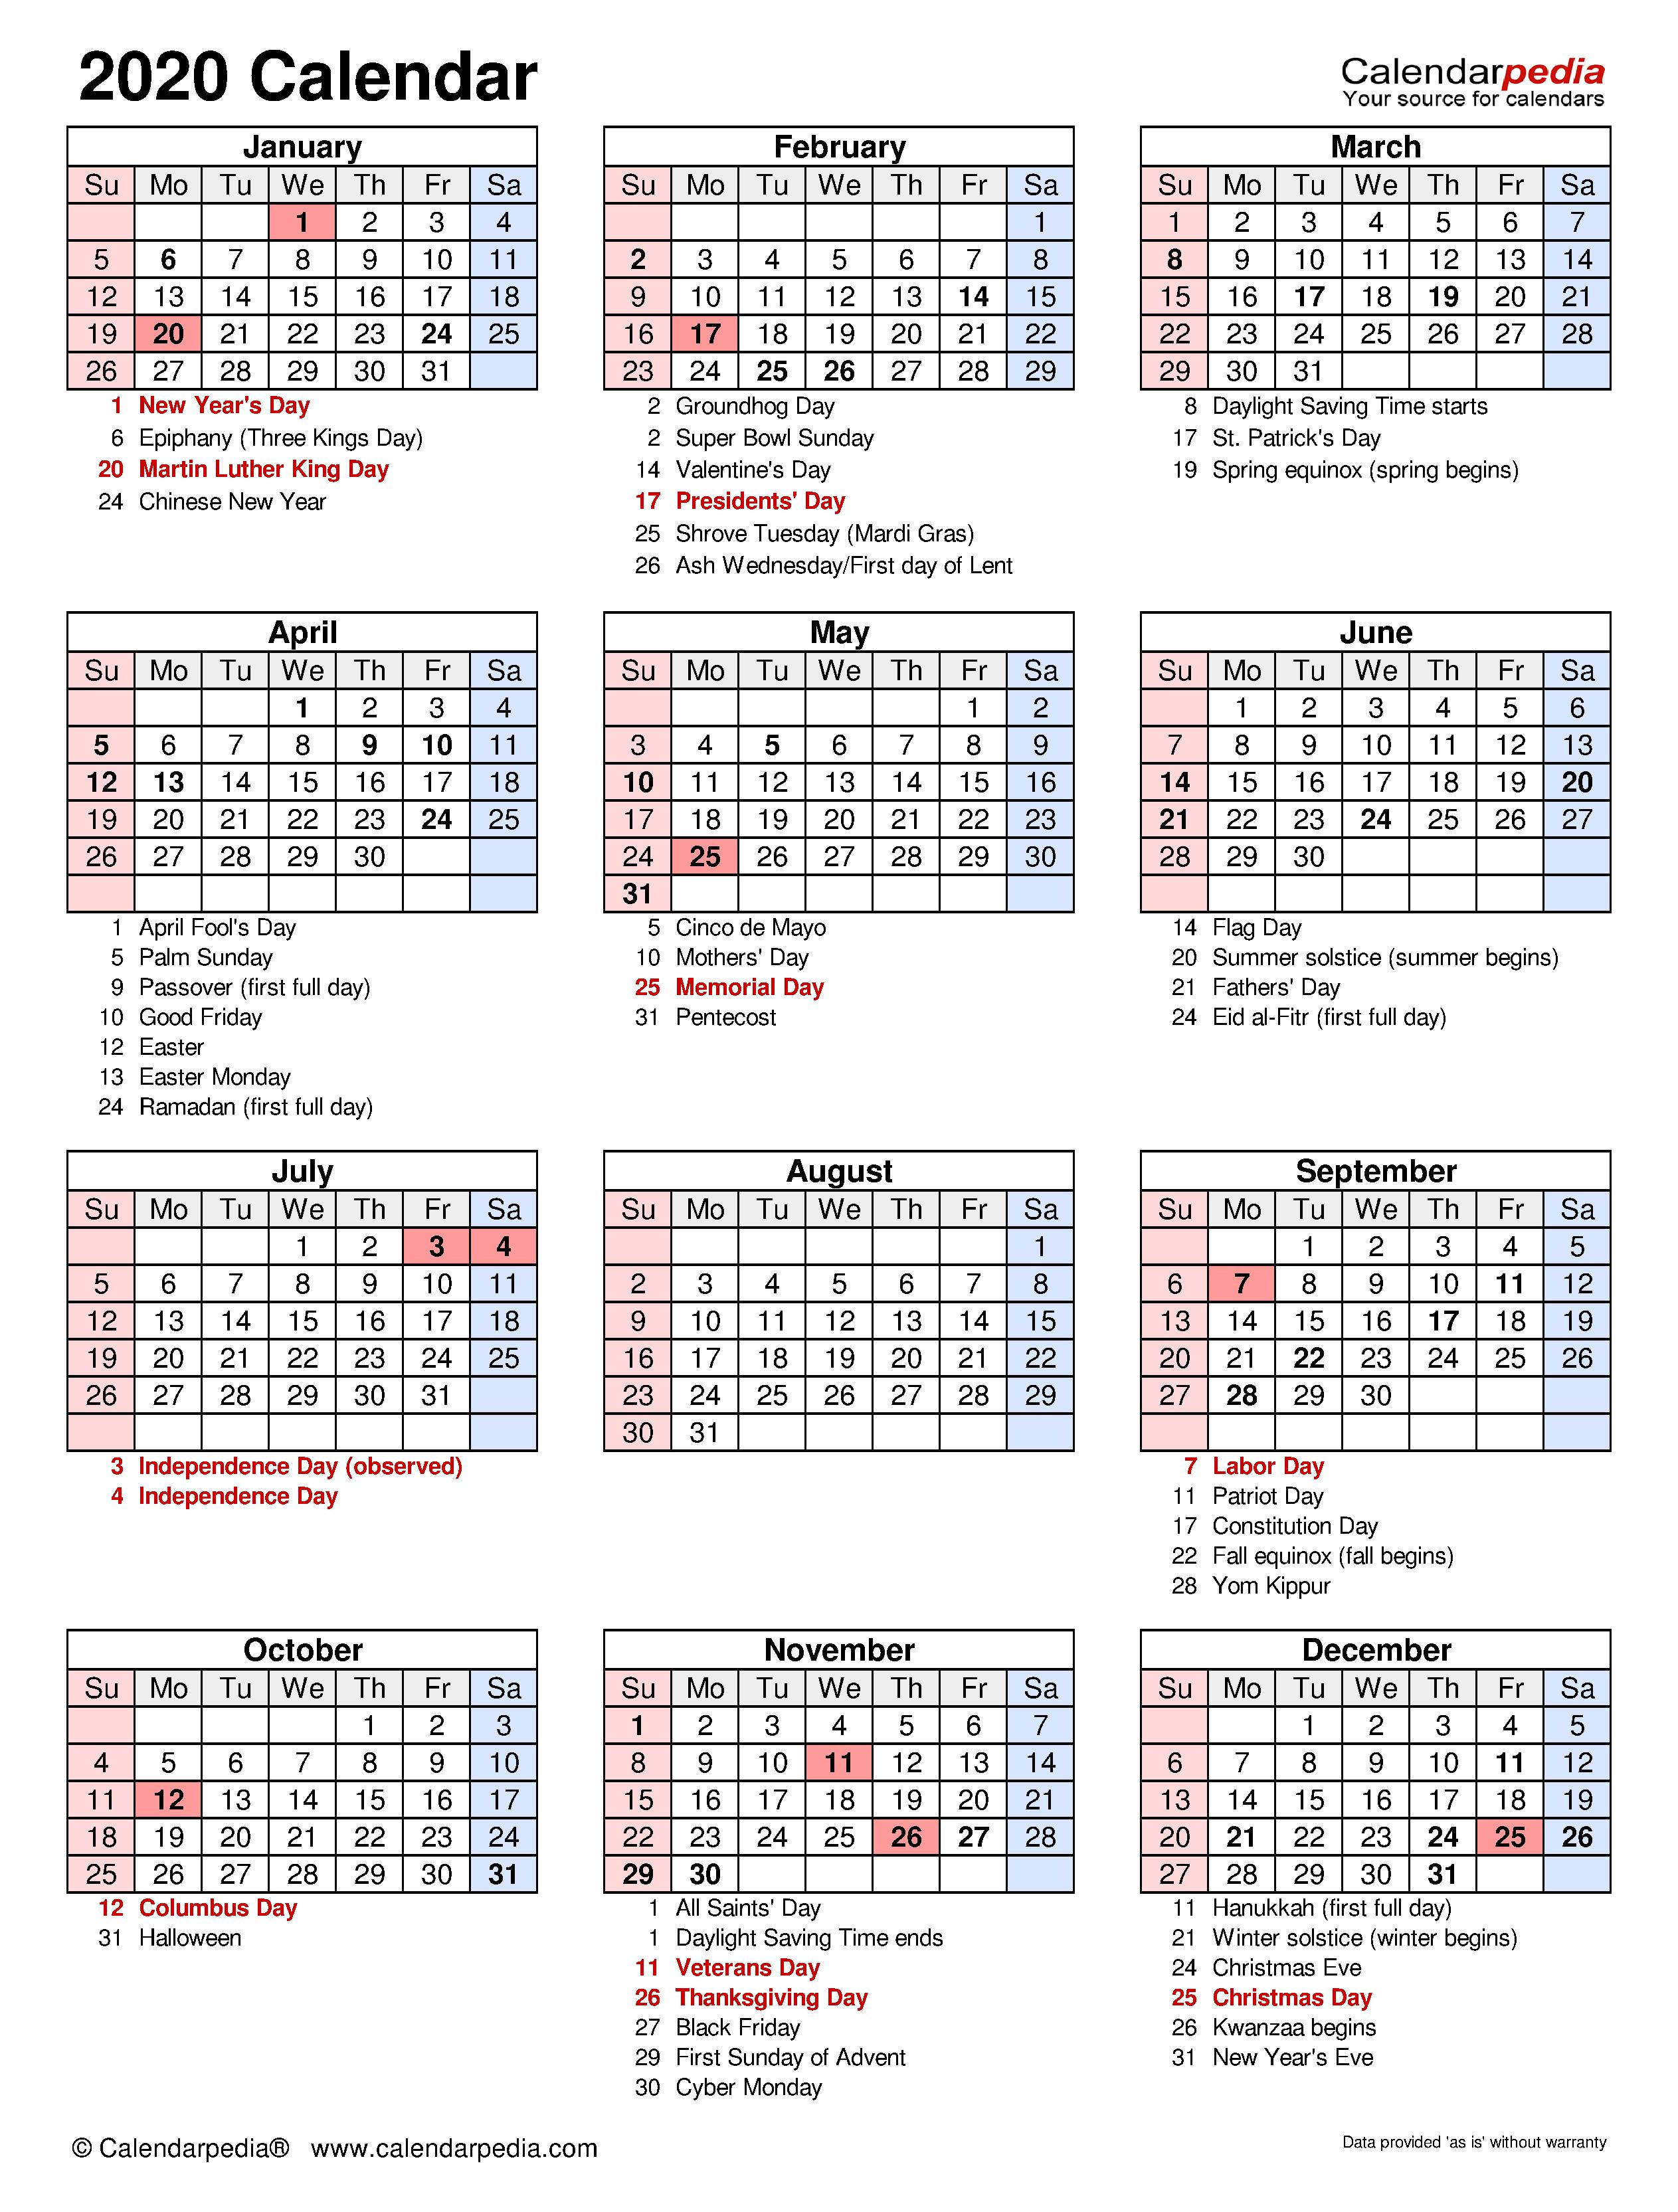 2020 Calendar Free Printable Excel Templates Calendarpedia ...